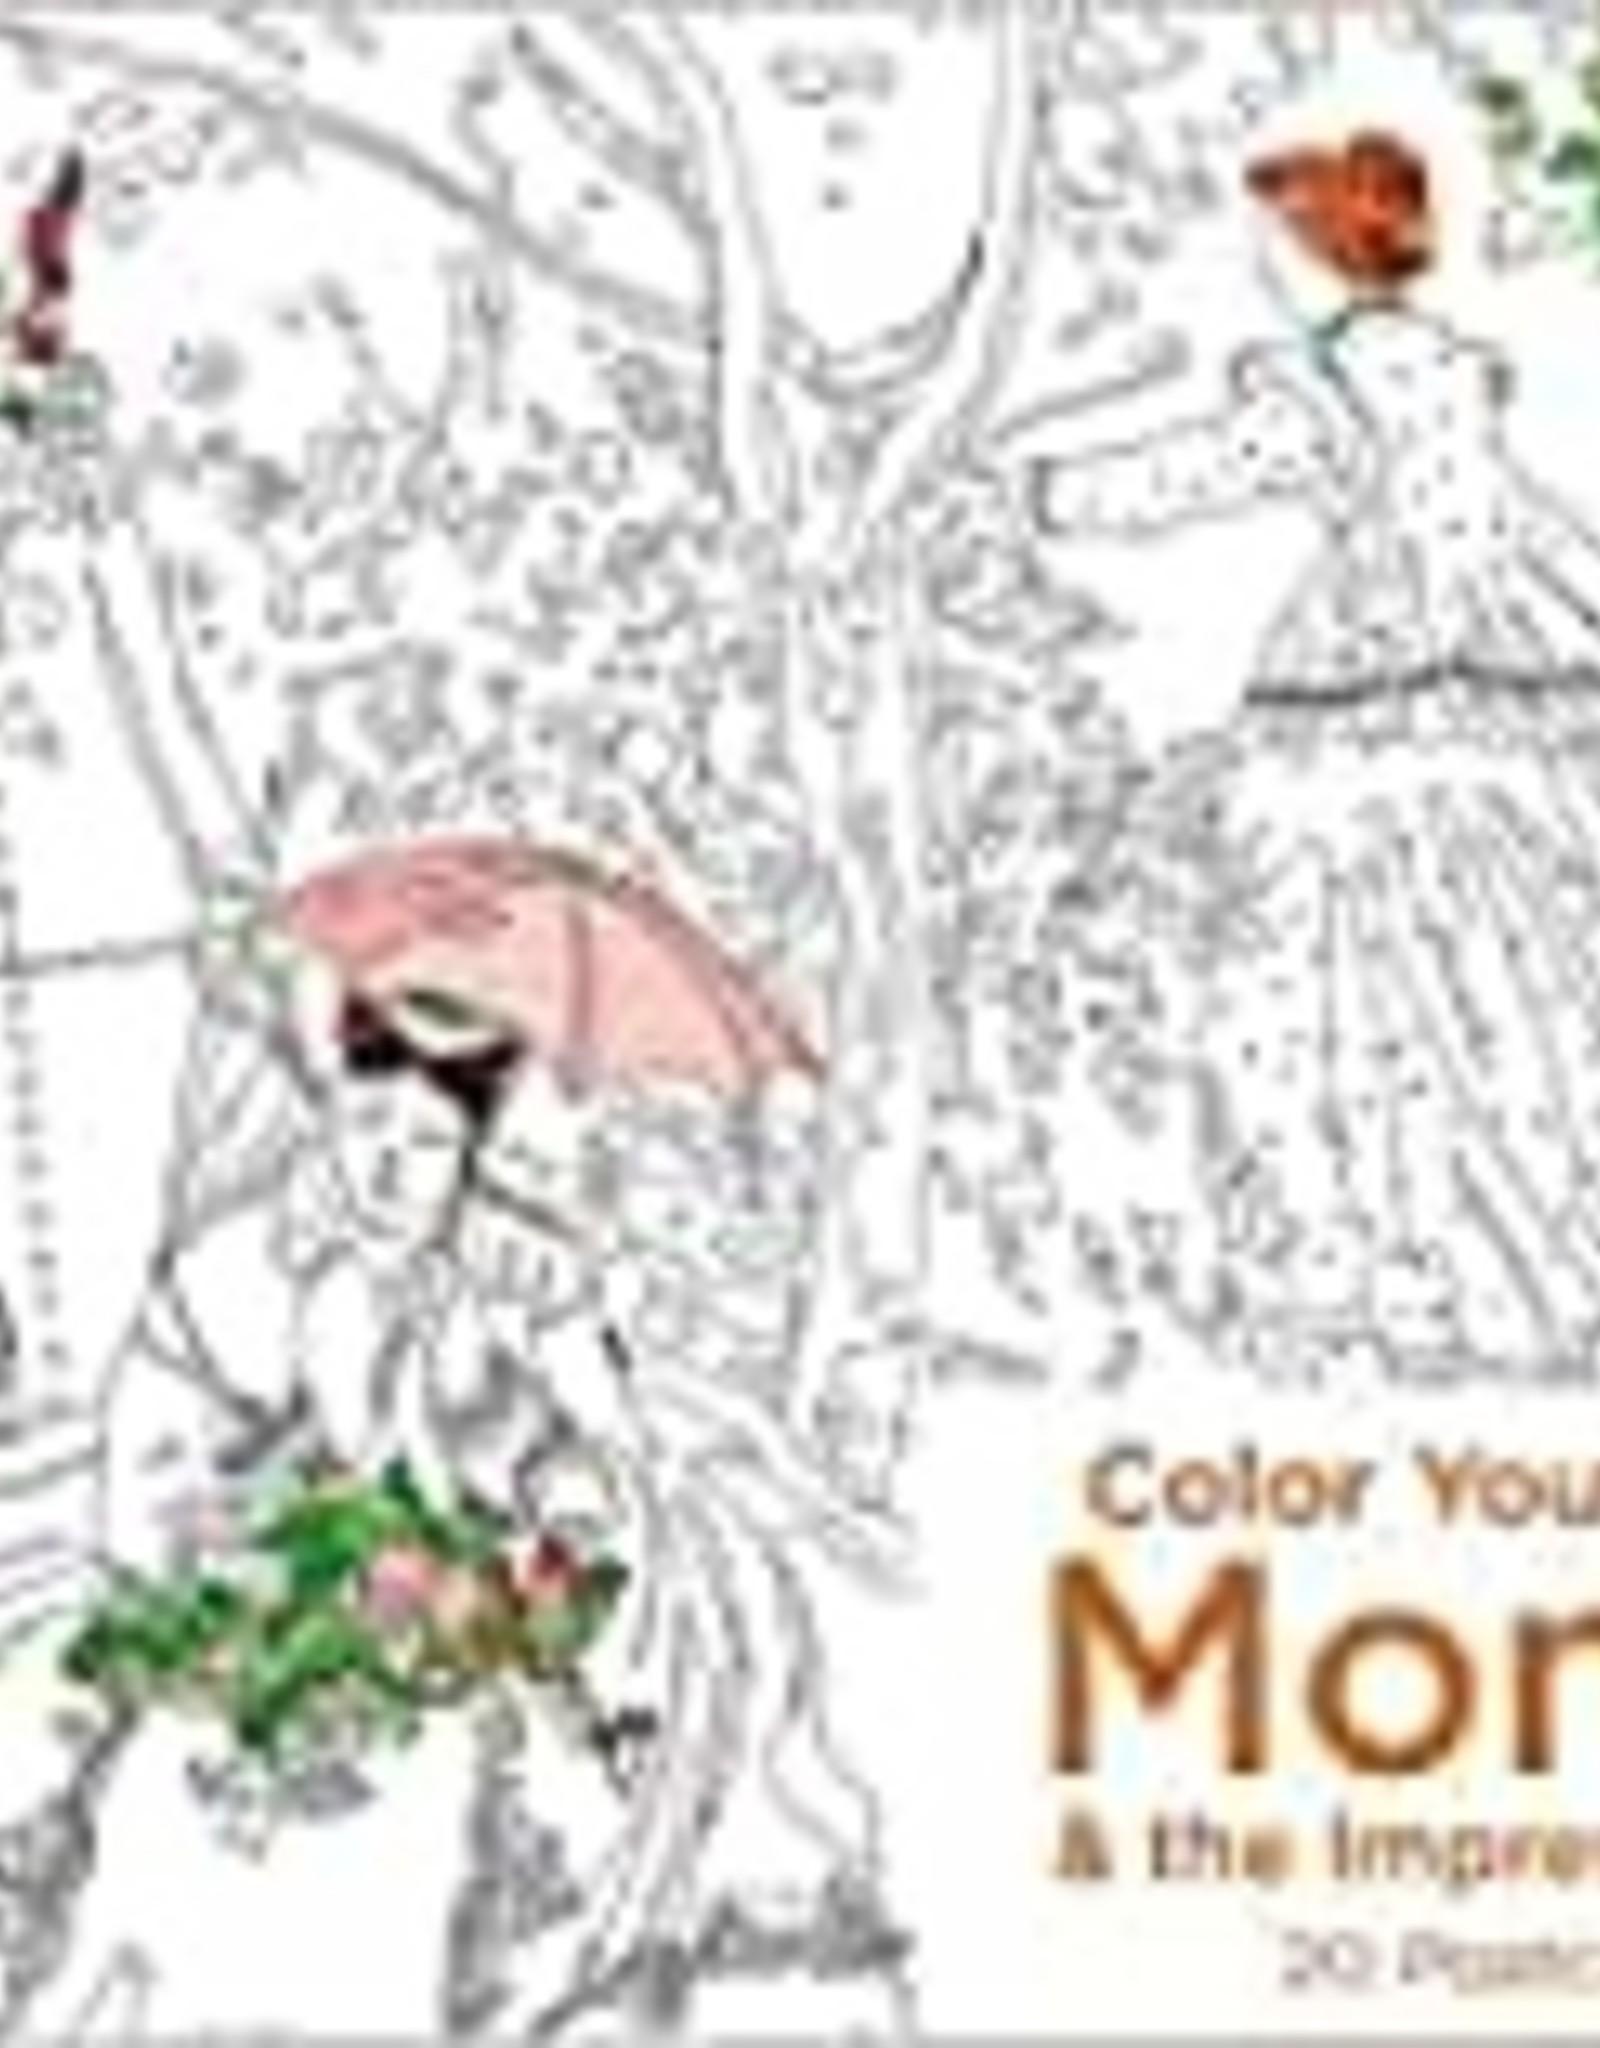 Color Your Own Monet